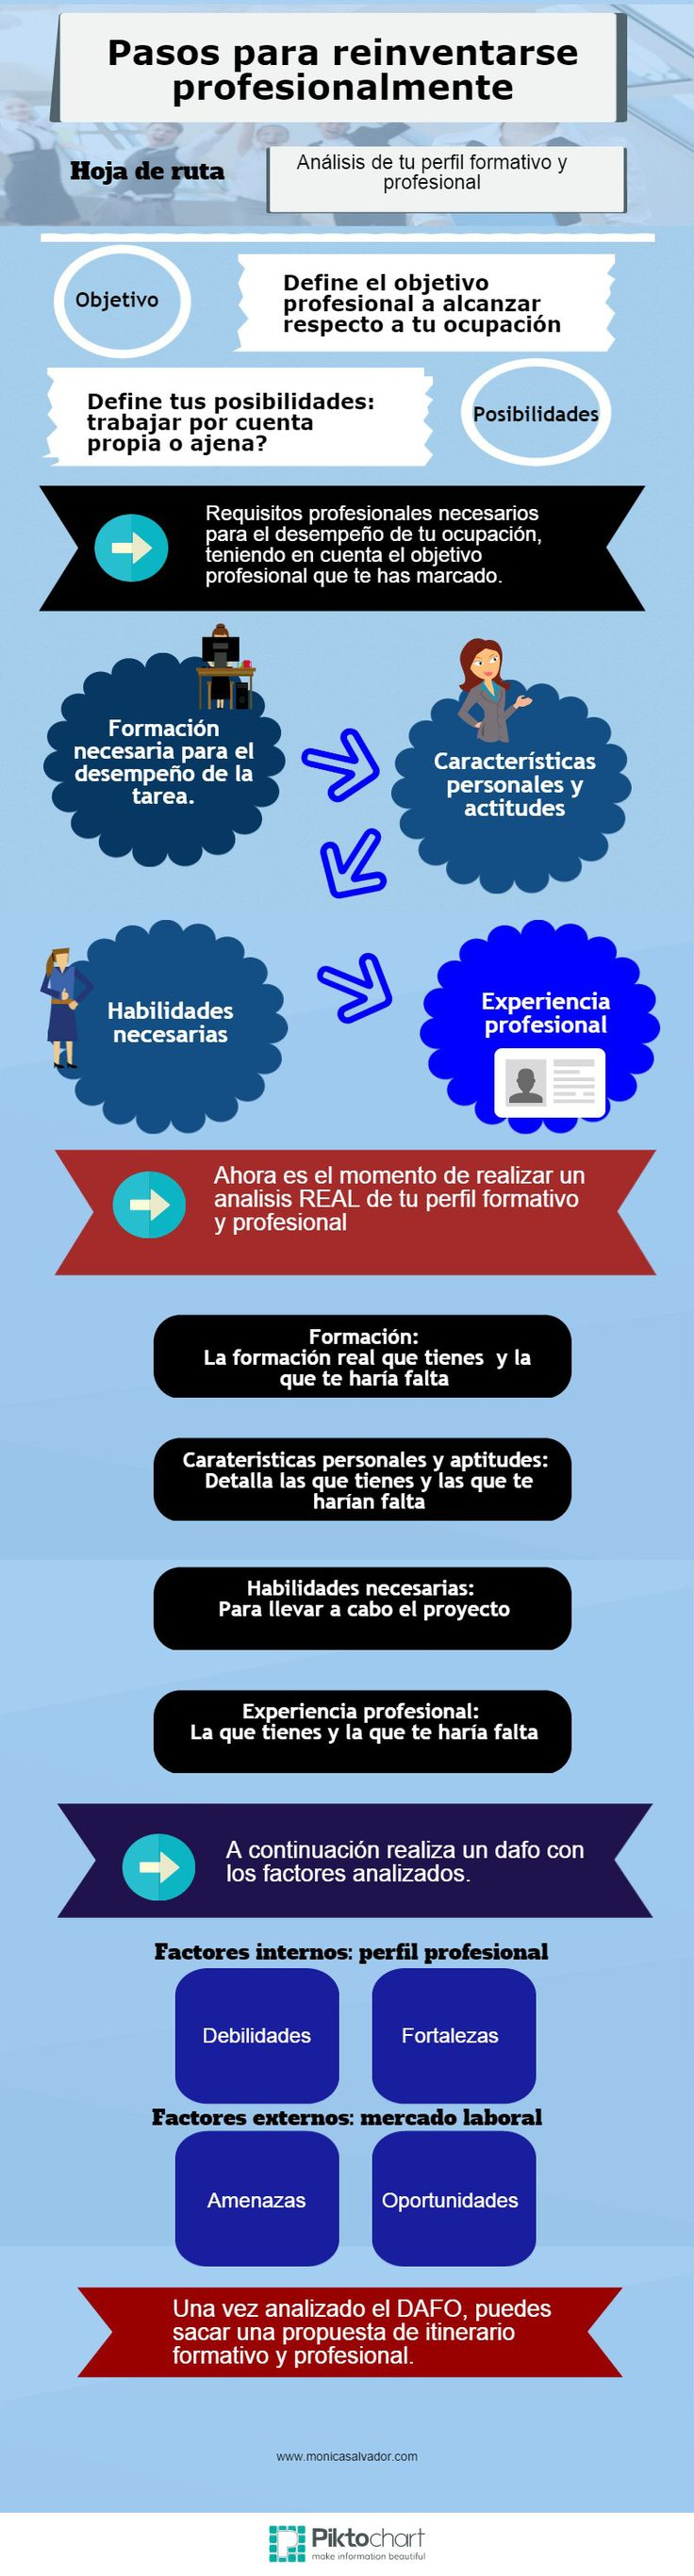 Pasos para reinventarse profesionalmente #tips #egresados #estudiantes #umayor